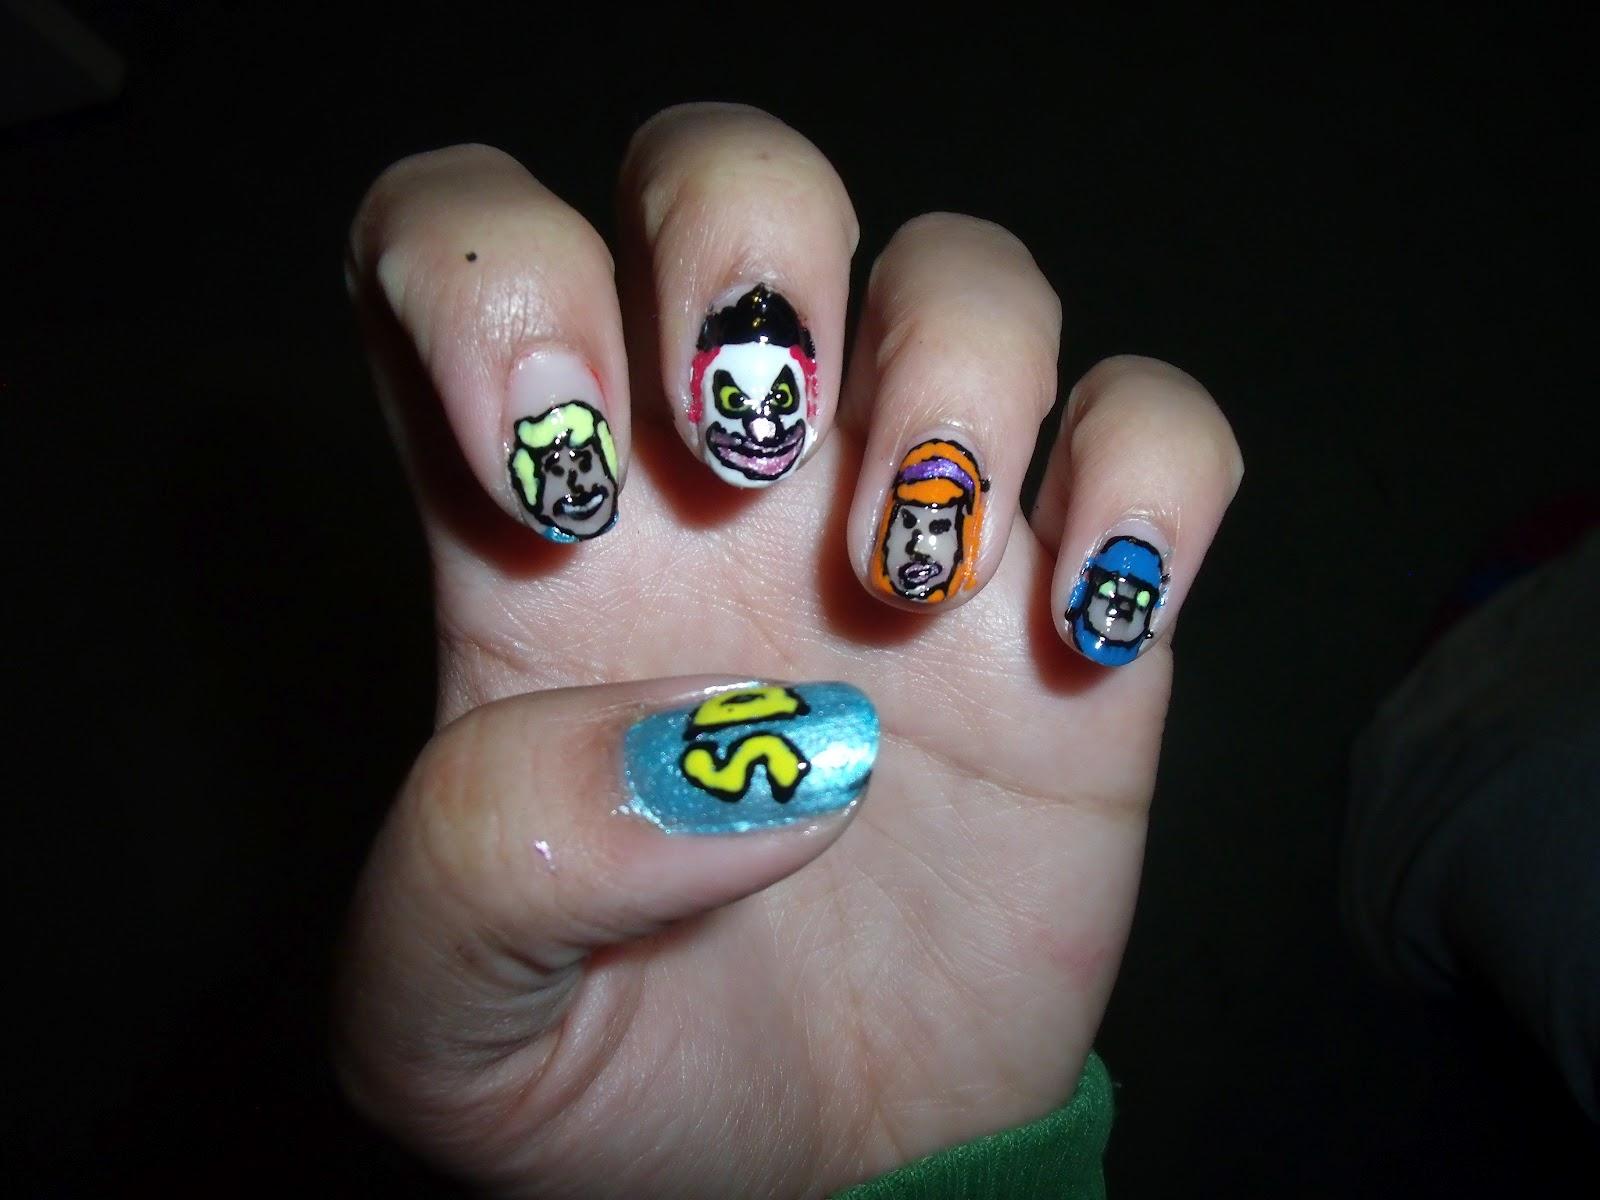 Handee Nail Tips 31 Day Nail Art Challenge Day 29